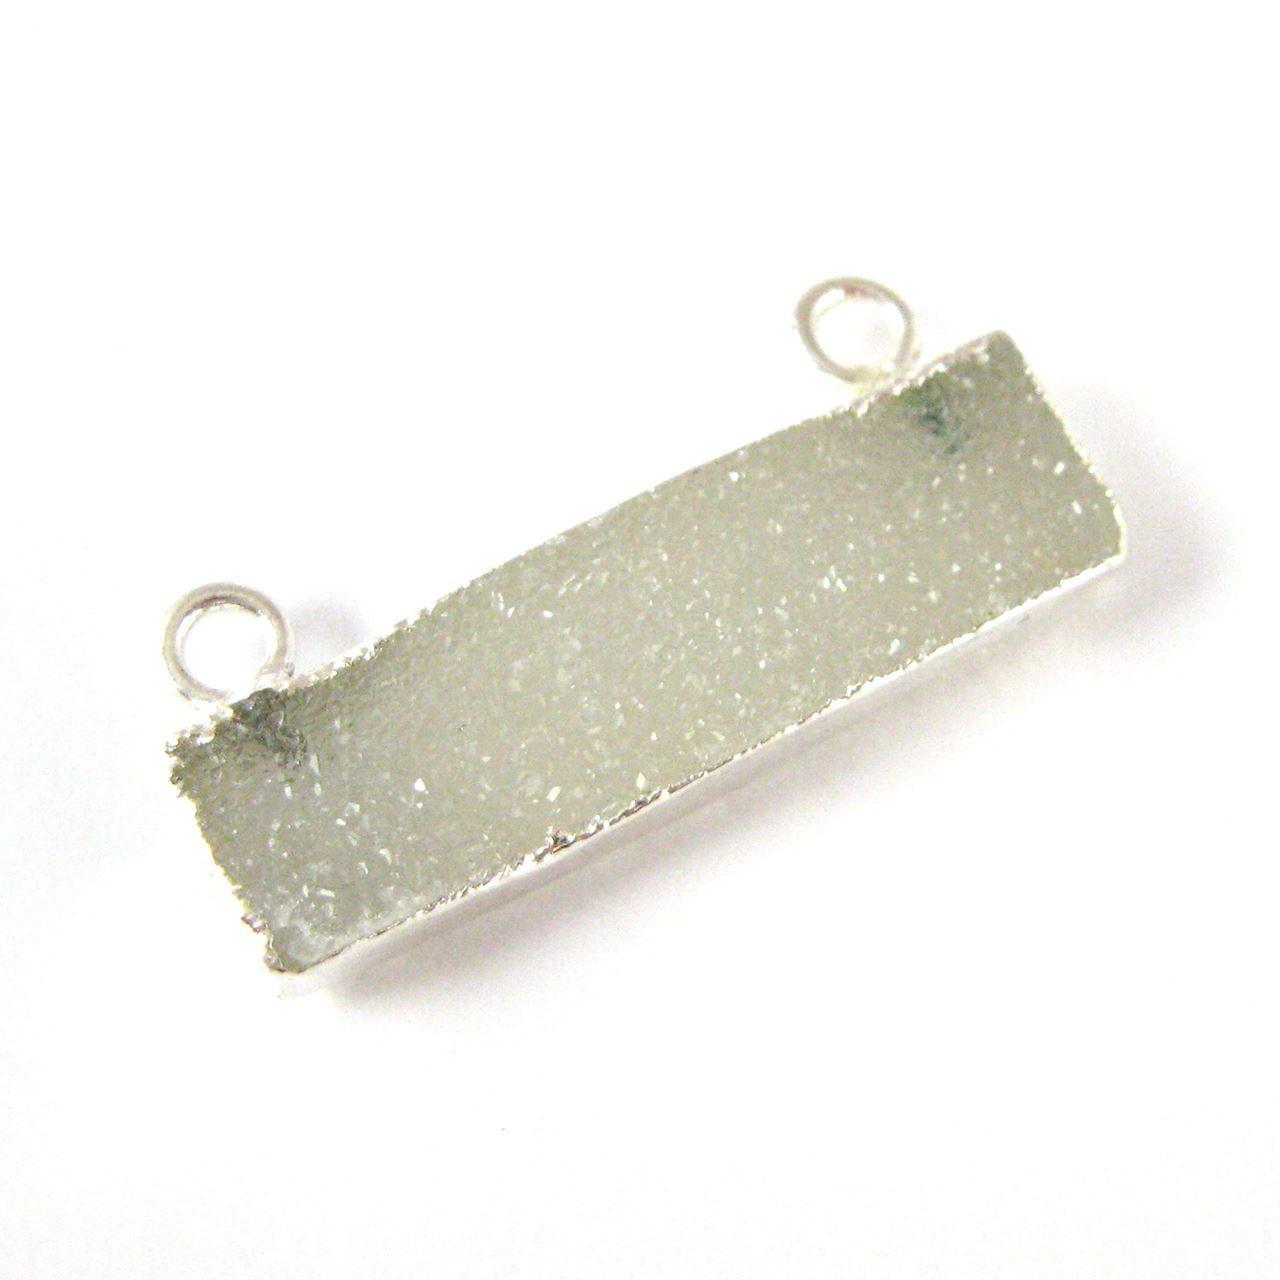 Natural Druzy Agate Bar Connector Pendant, Silver plated Long Horizontal Bar-Grey